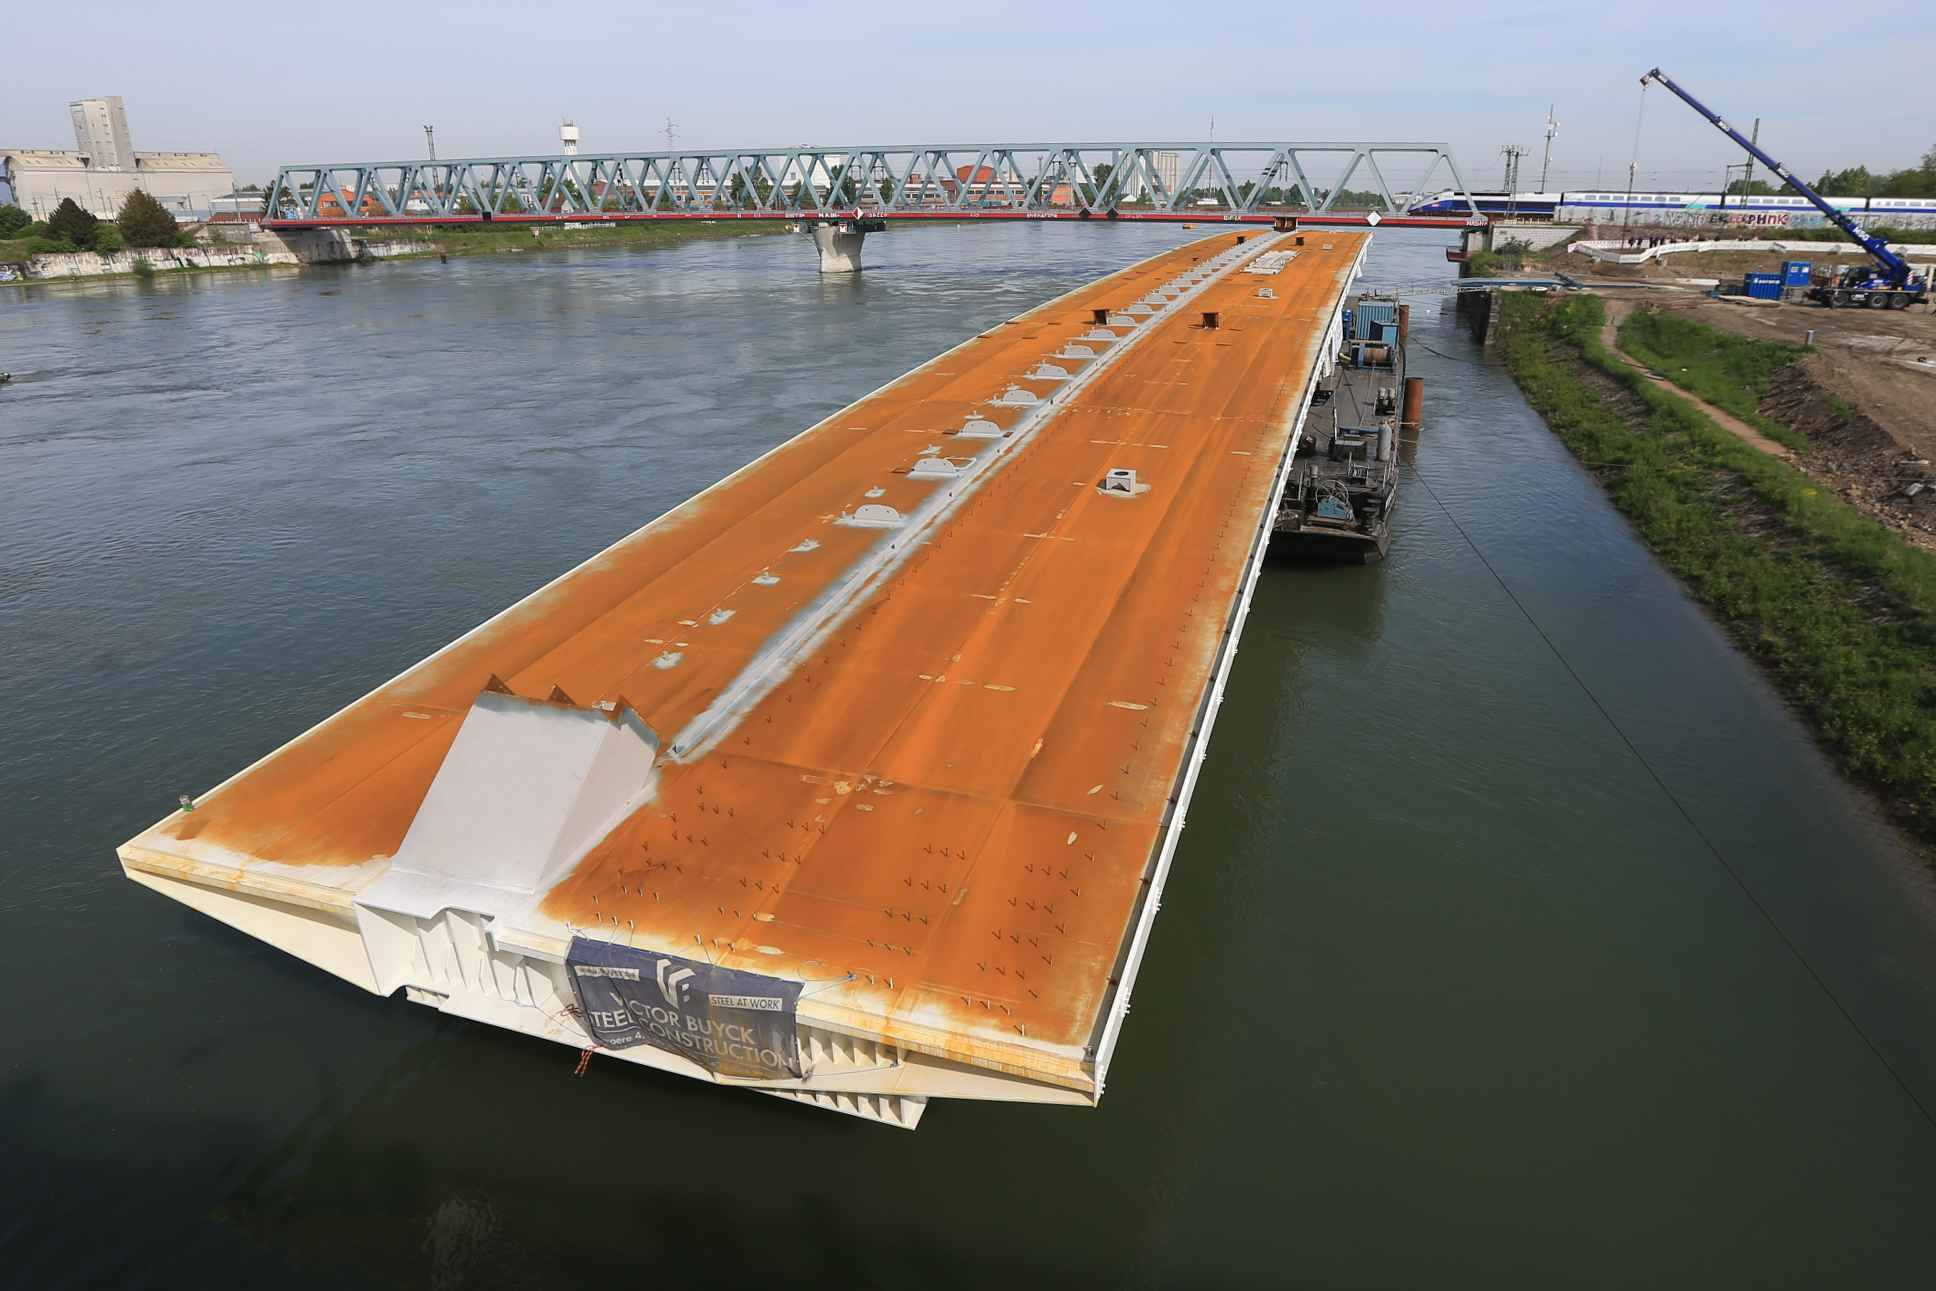 strasbourg le nouveau pont d barque vers l 39 allemagne. Black Bedroom Furniture Sets. Home Design Ideas